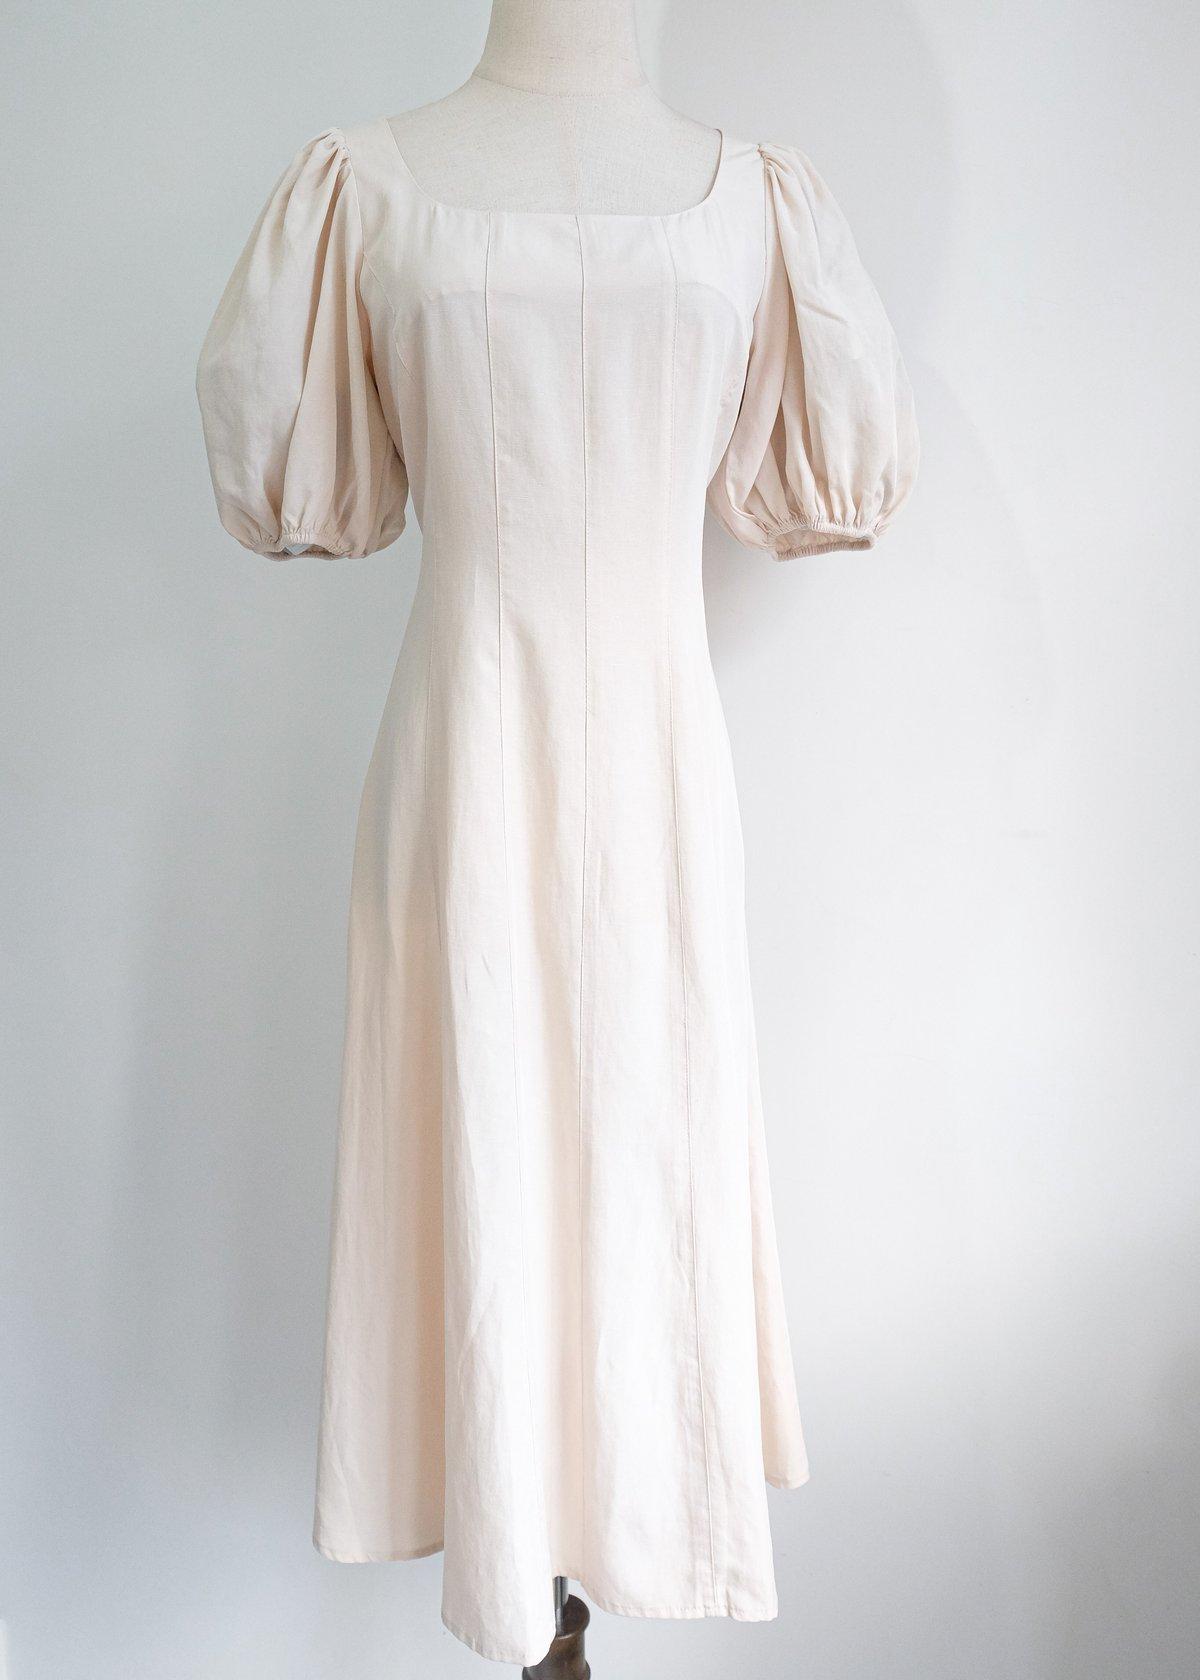 Image of SAMPLE SALE - Unreleased Dress 31